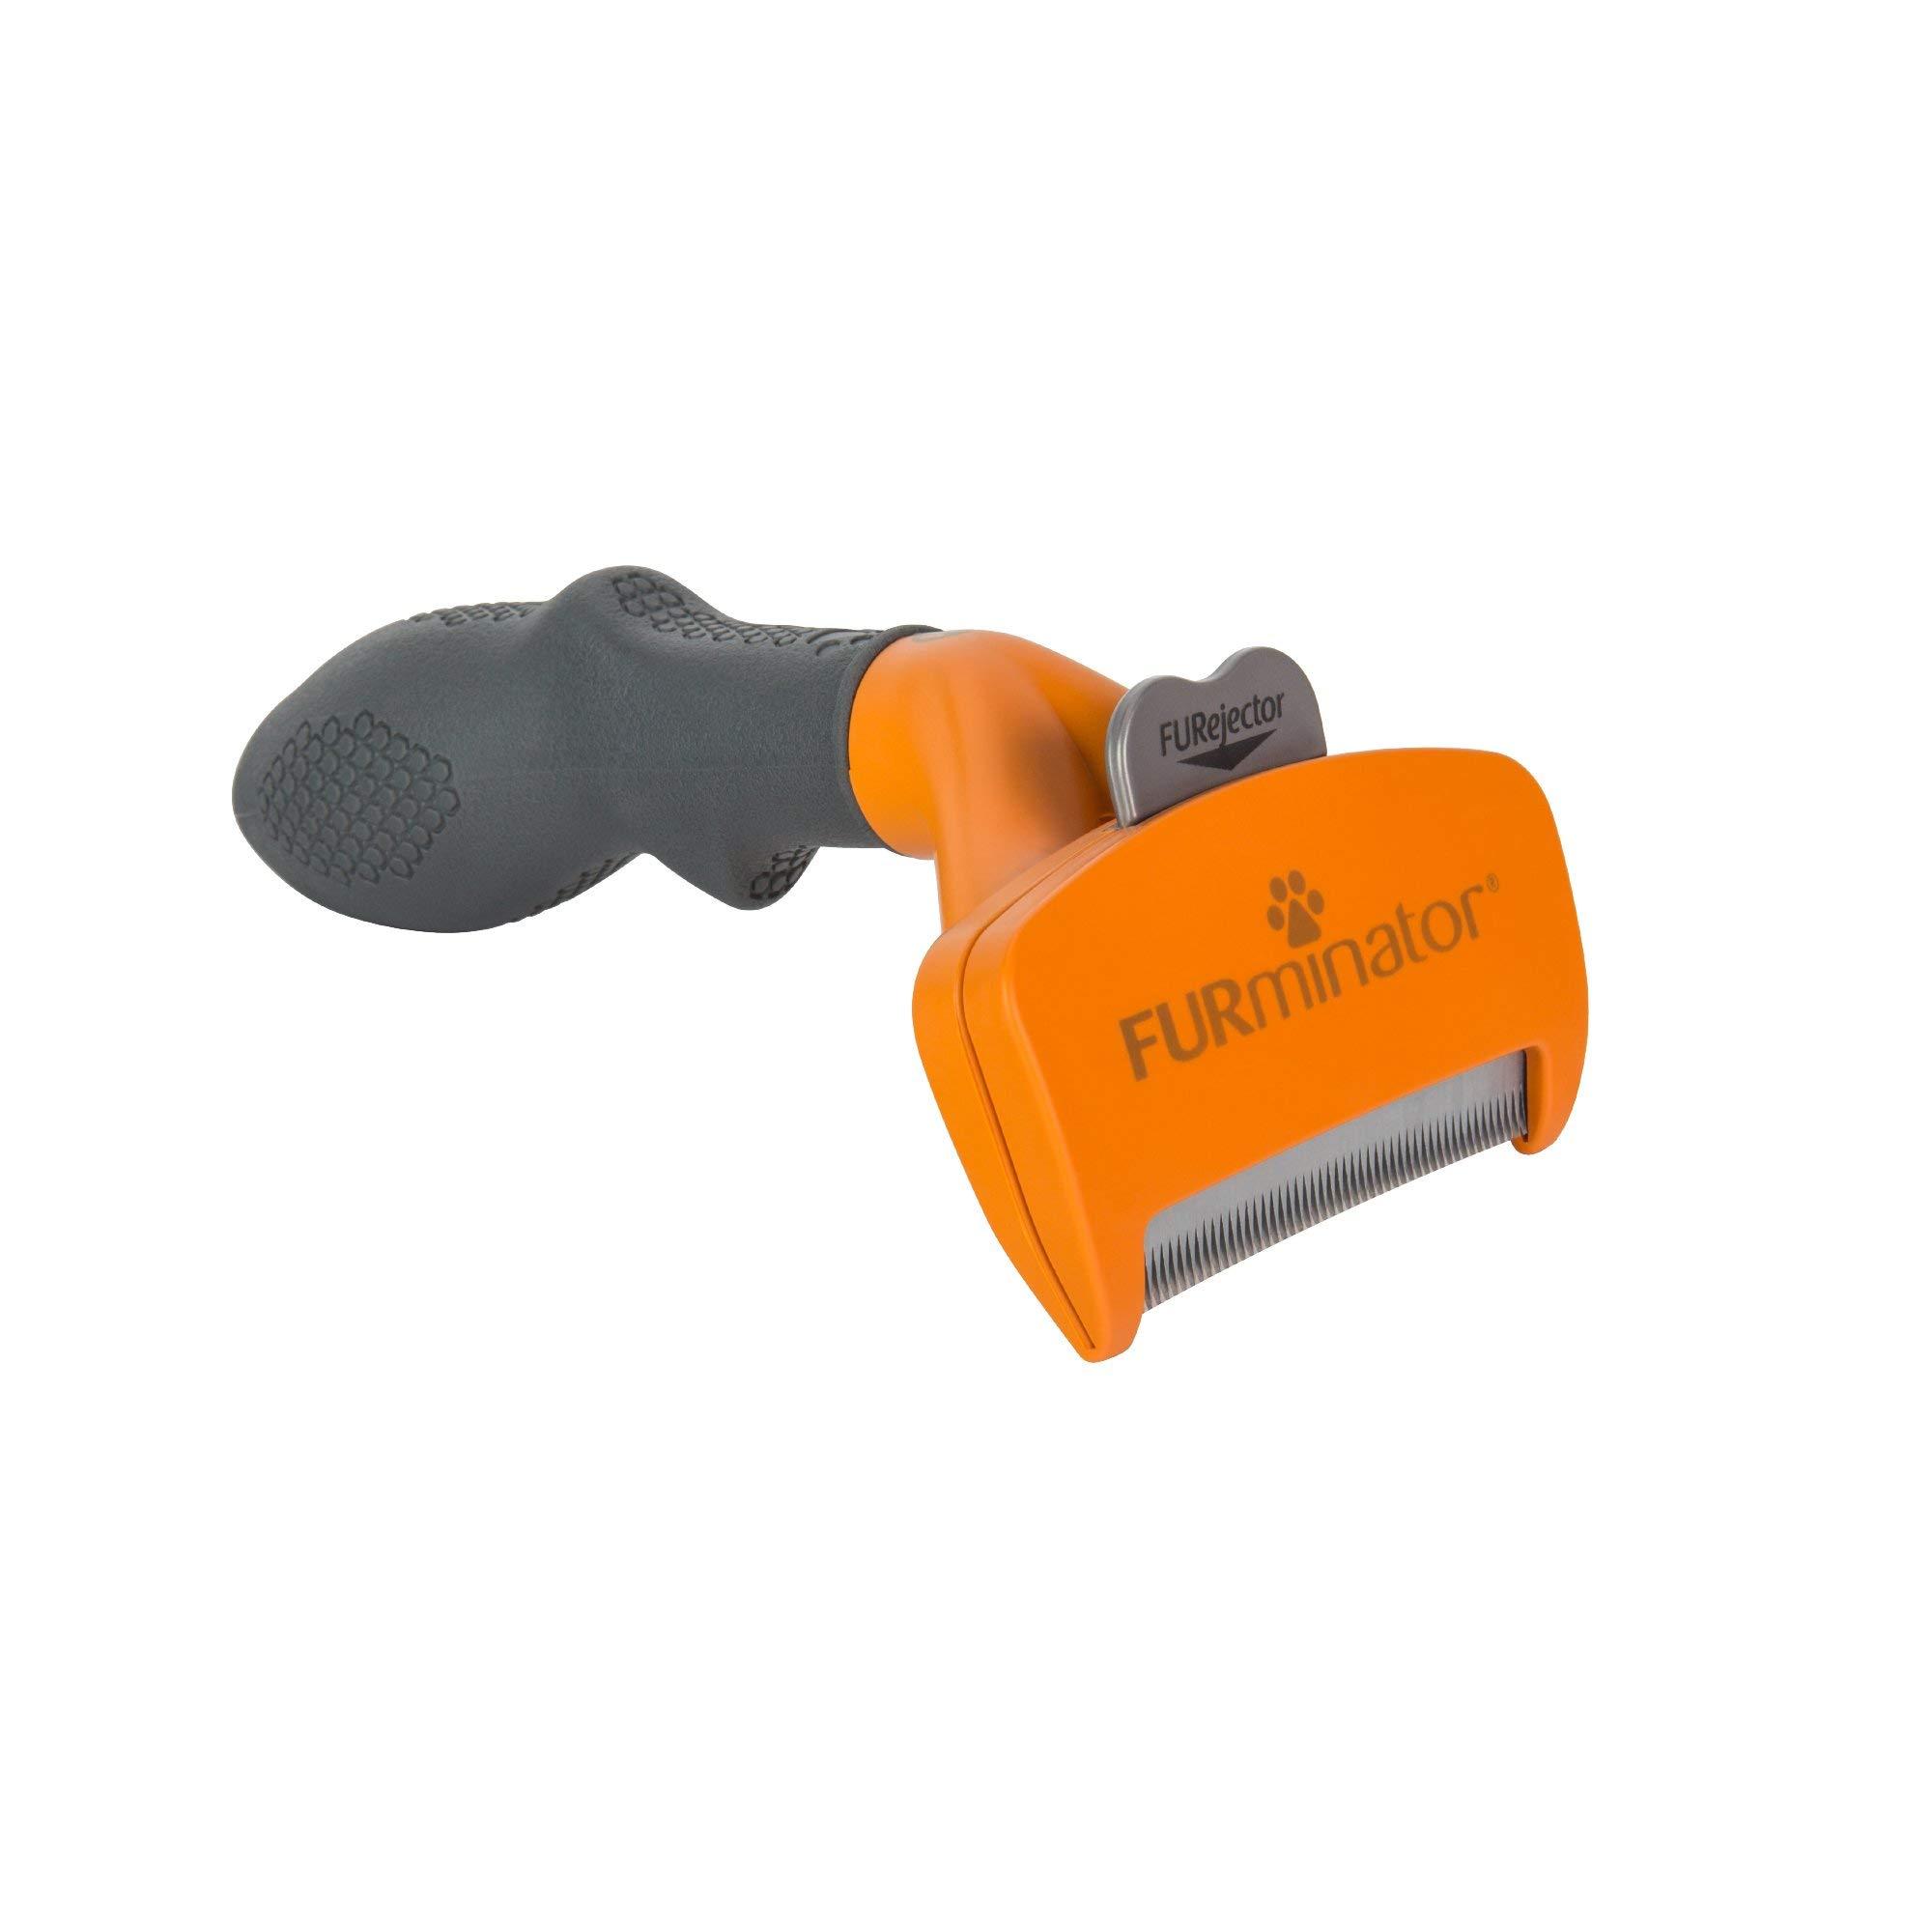 Furminator Short Hair deShedding Tool for Medium Dogs, Standard